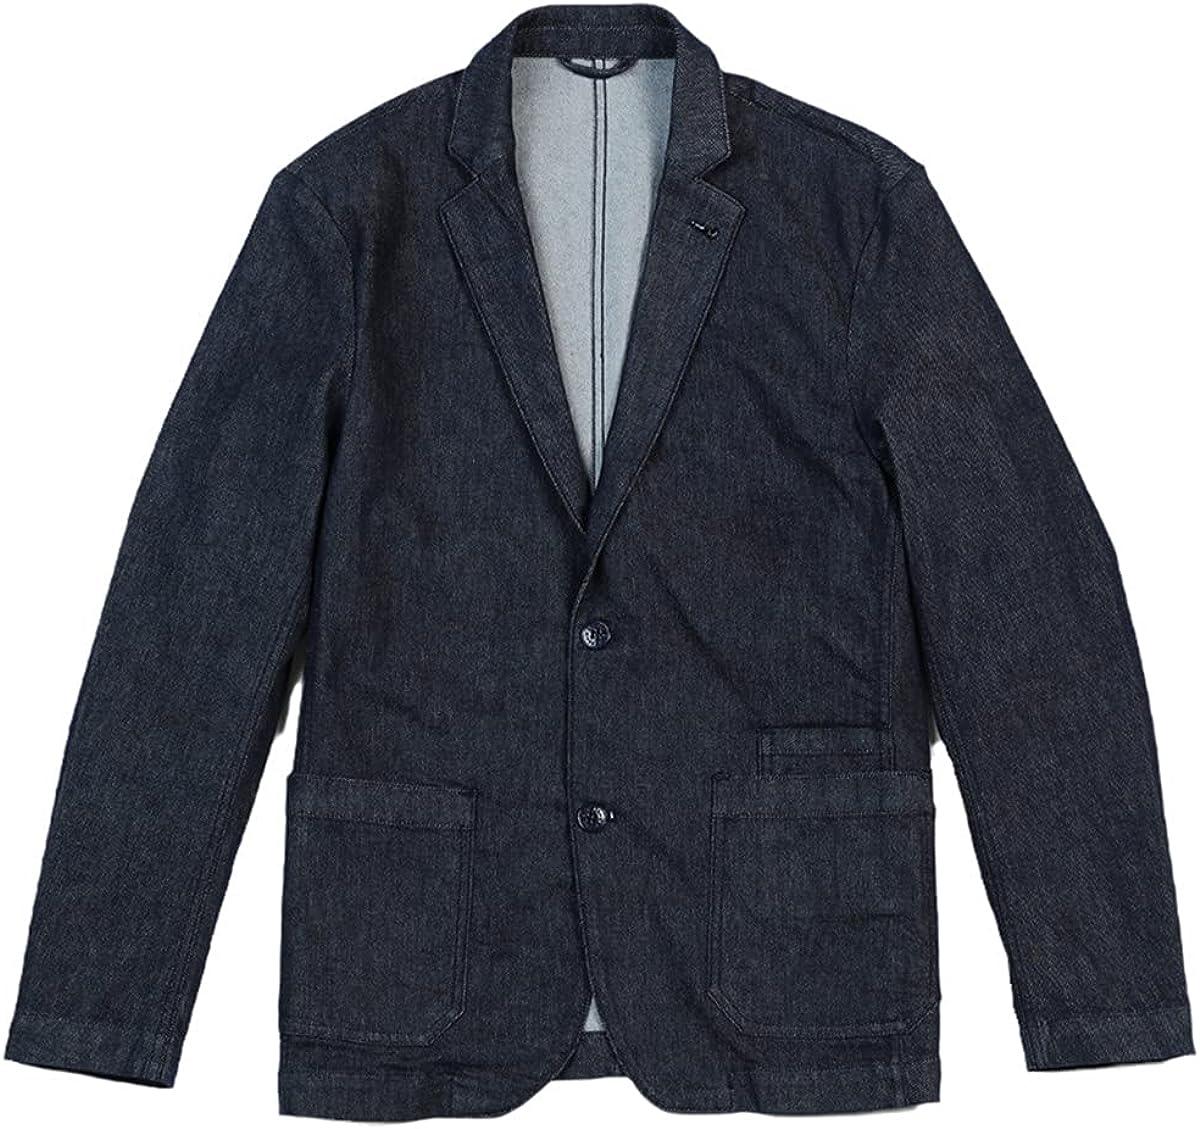 DFLYHLH Fall Casual Denim Suit Jacket Men's Slim Jacket Plus Size Jacket